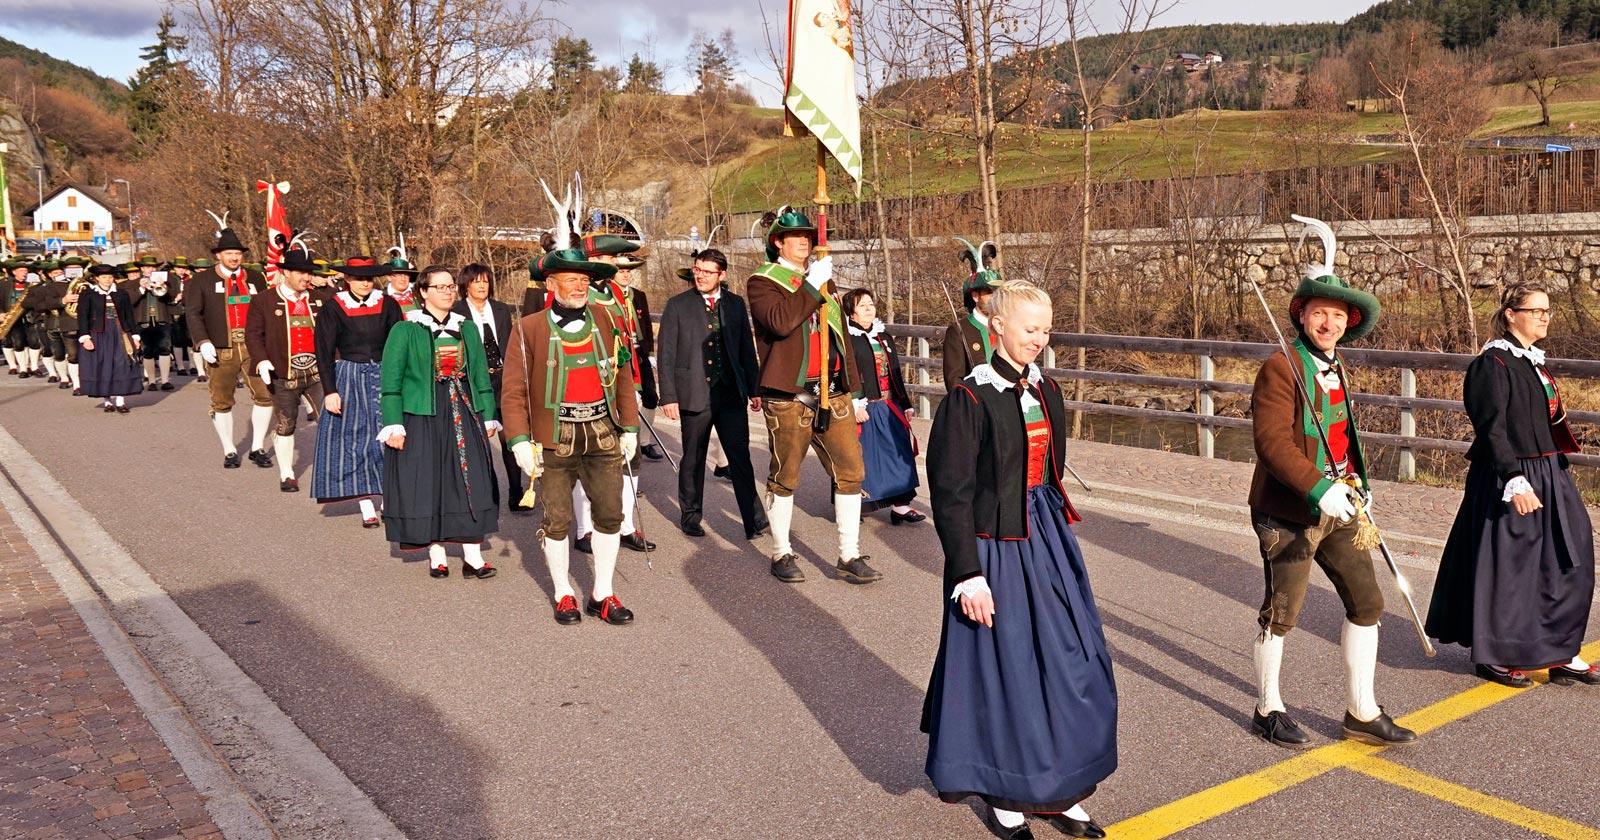 Bezirkstag der Pustertaler Schützen – Durch Zusammenhalt stark